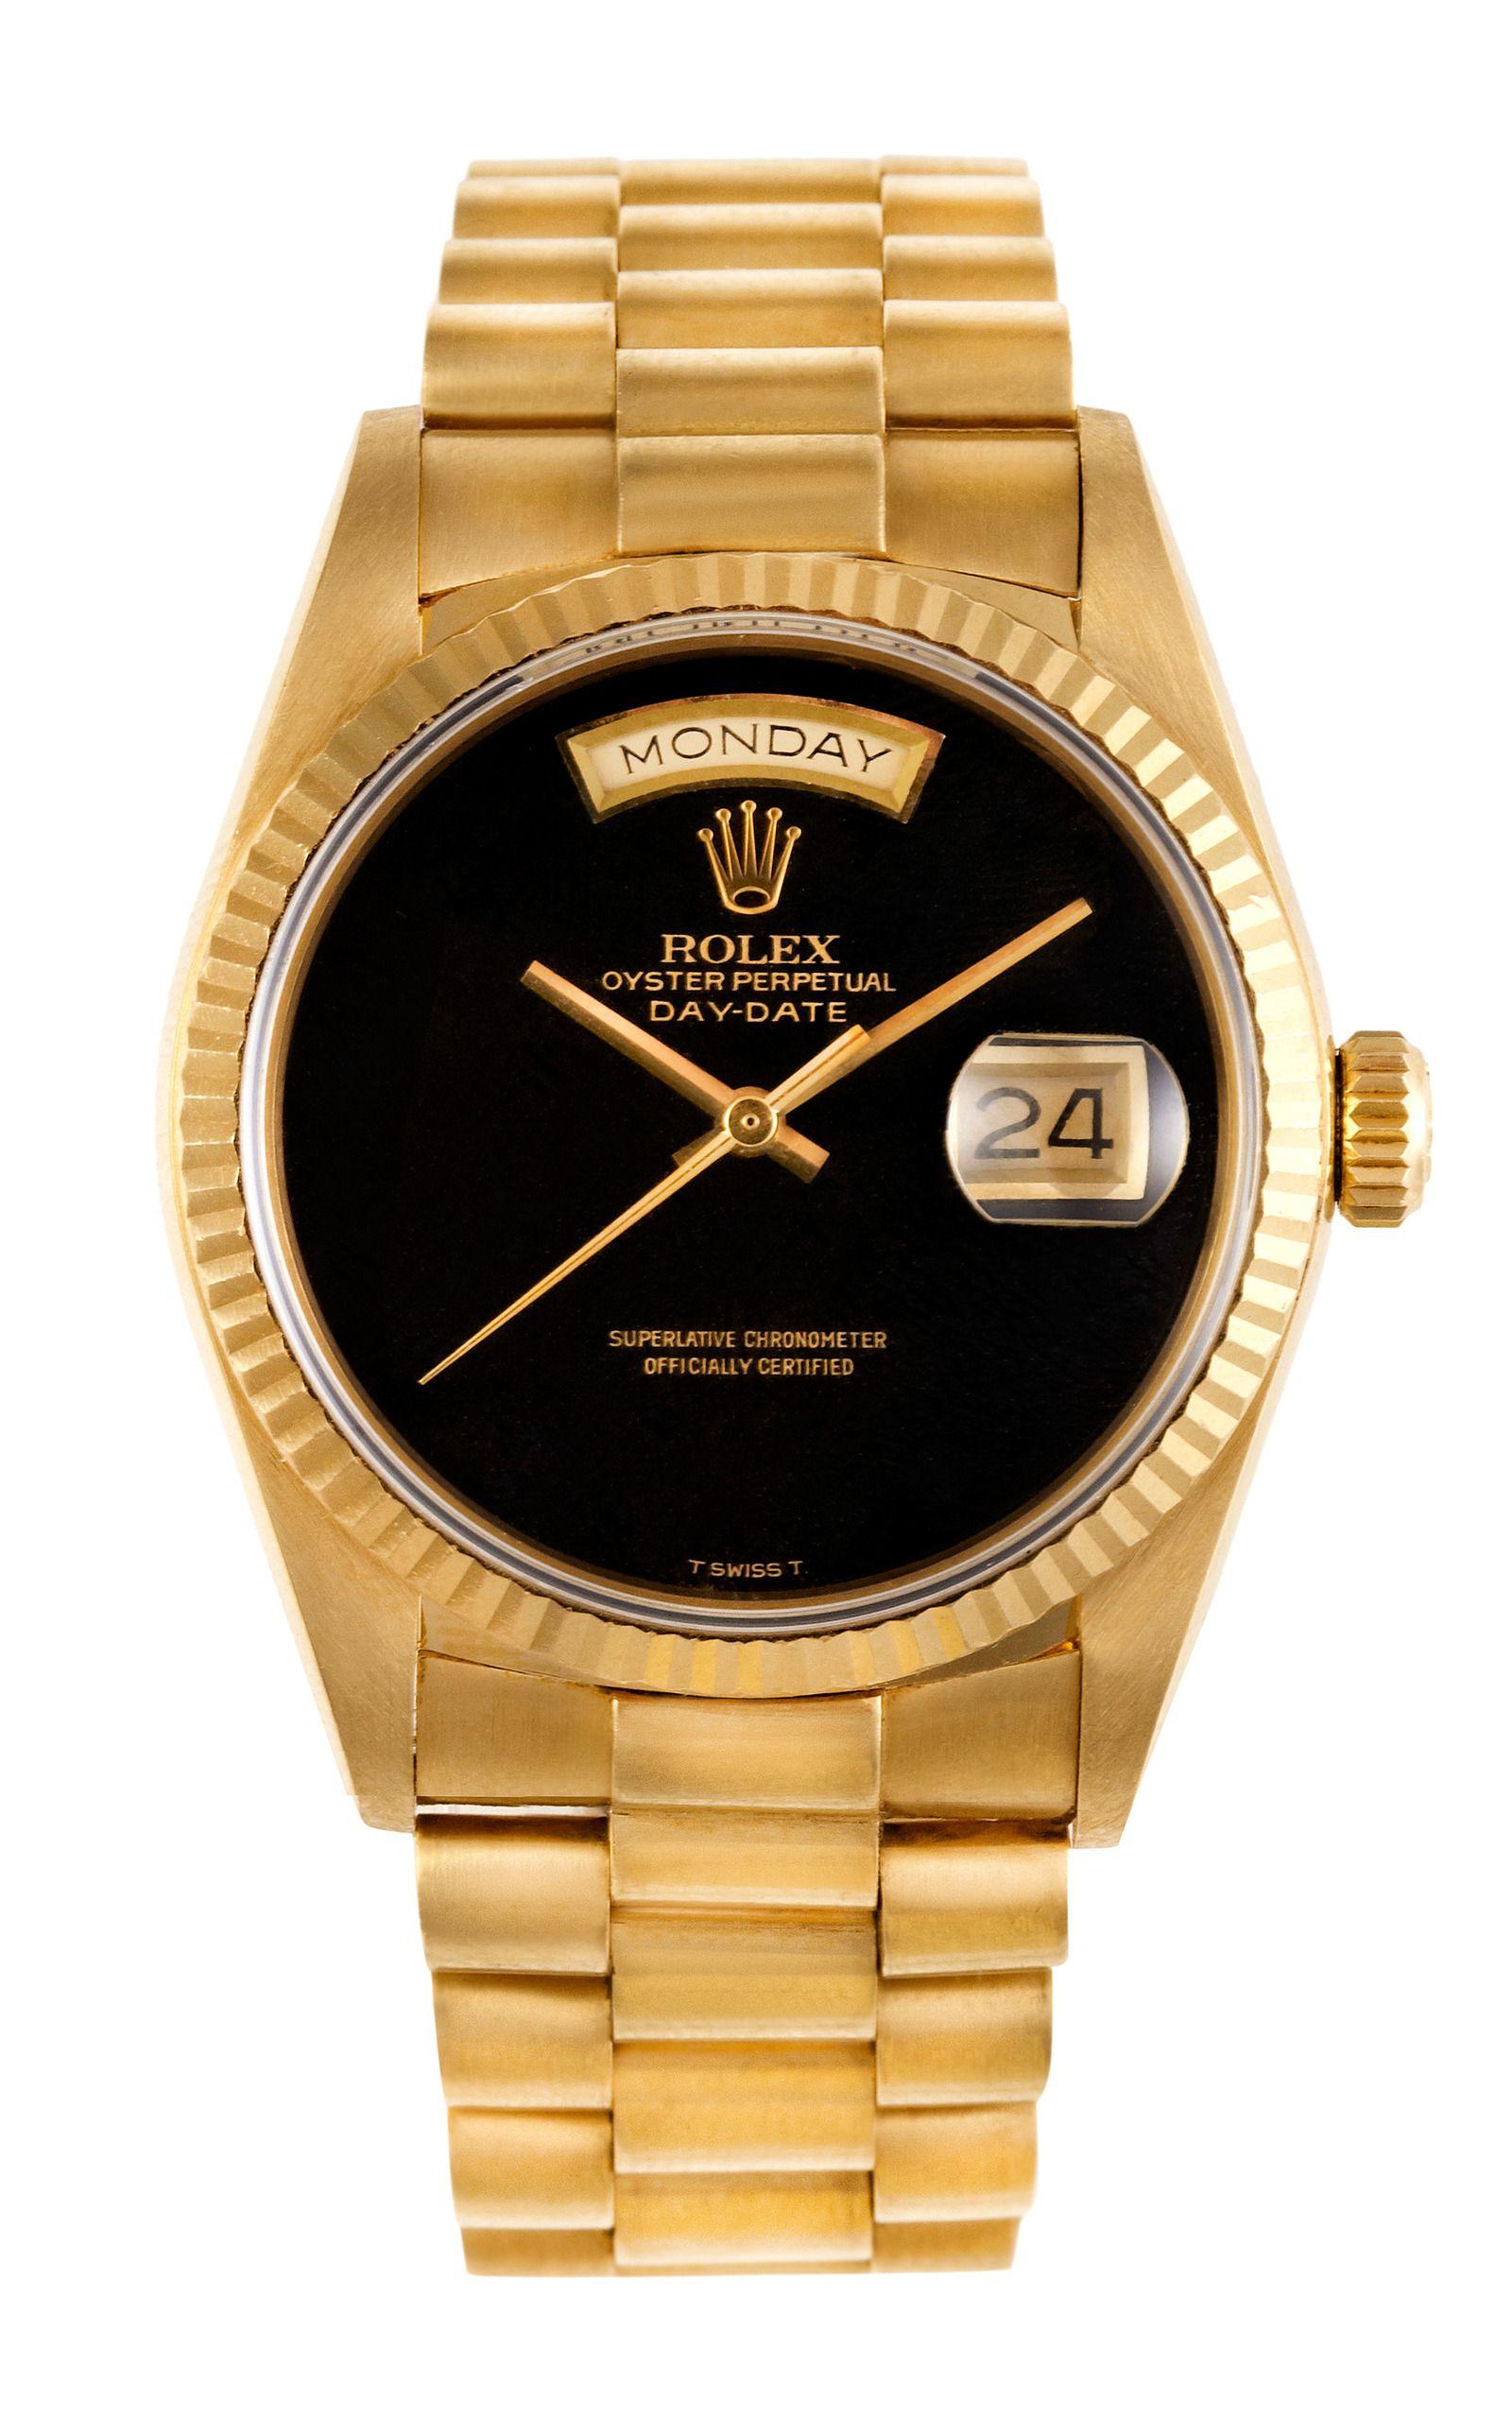 Rolex Day Date President With Black Onyx Dial Luxus Uhren Watches Rolex Diamant Rolex